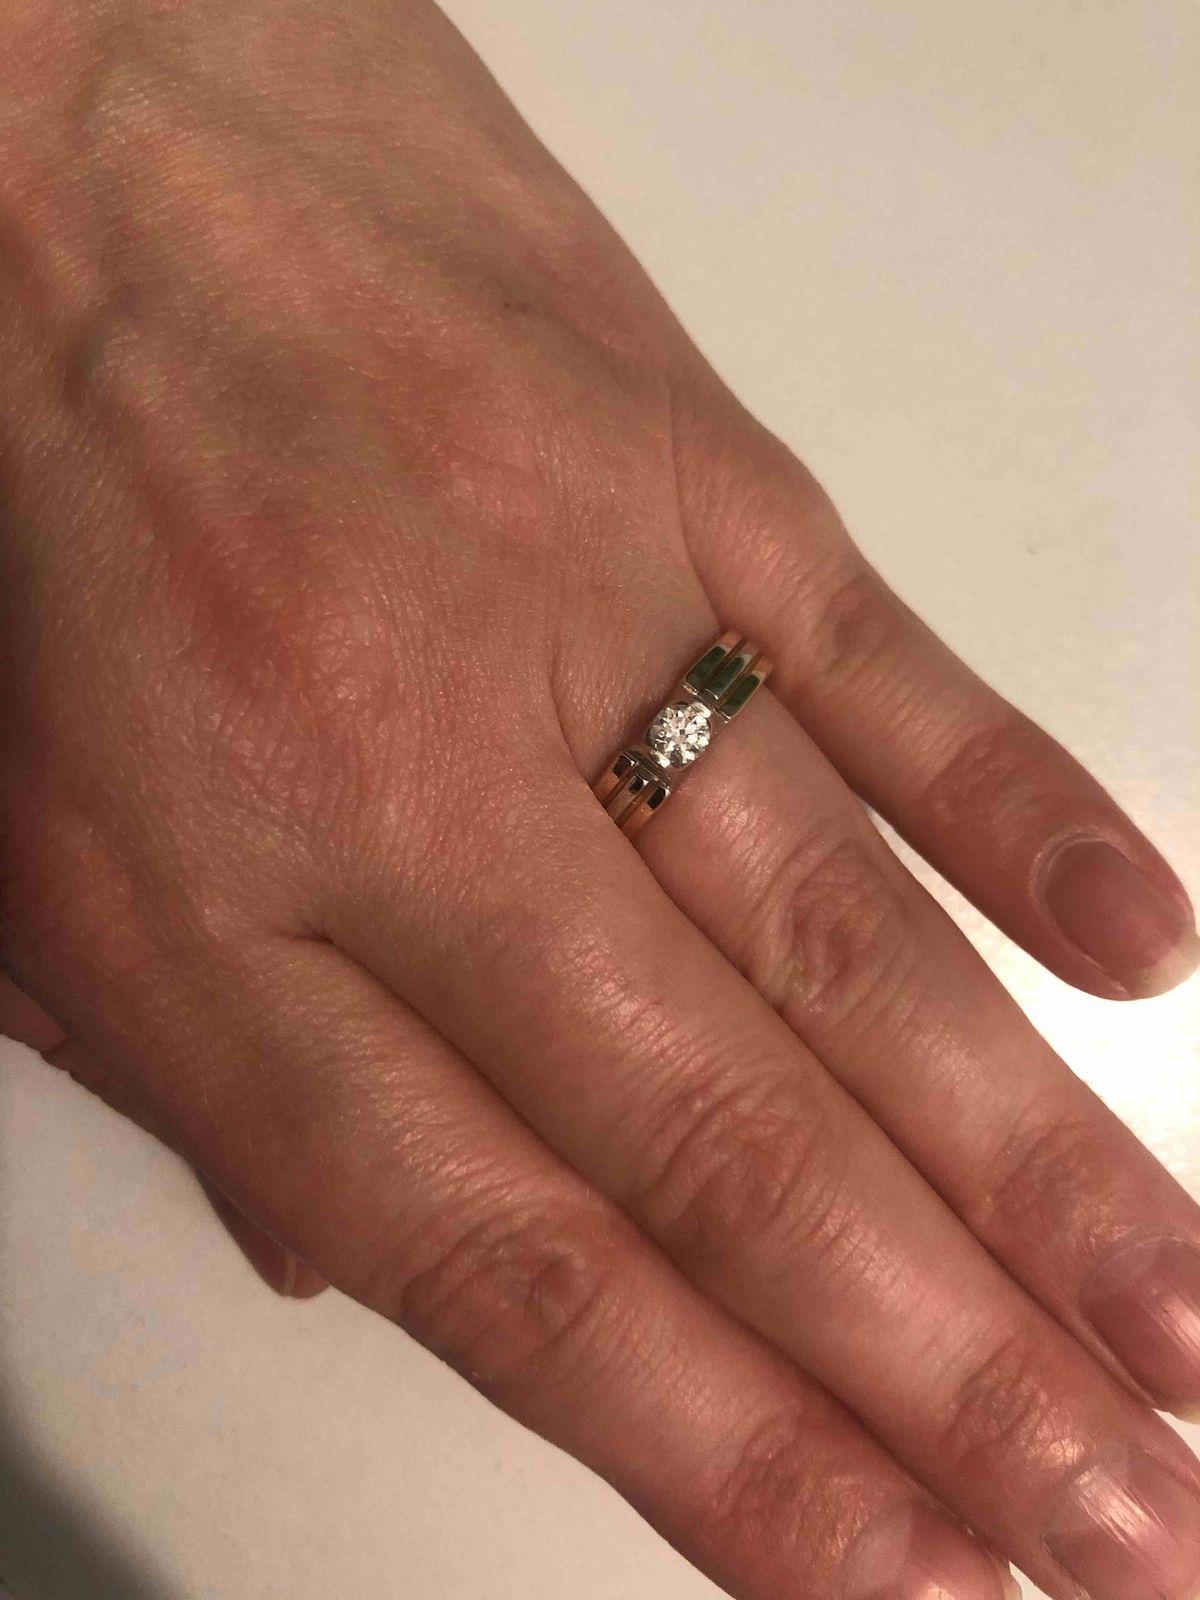 Красивое кольцо )